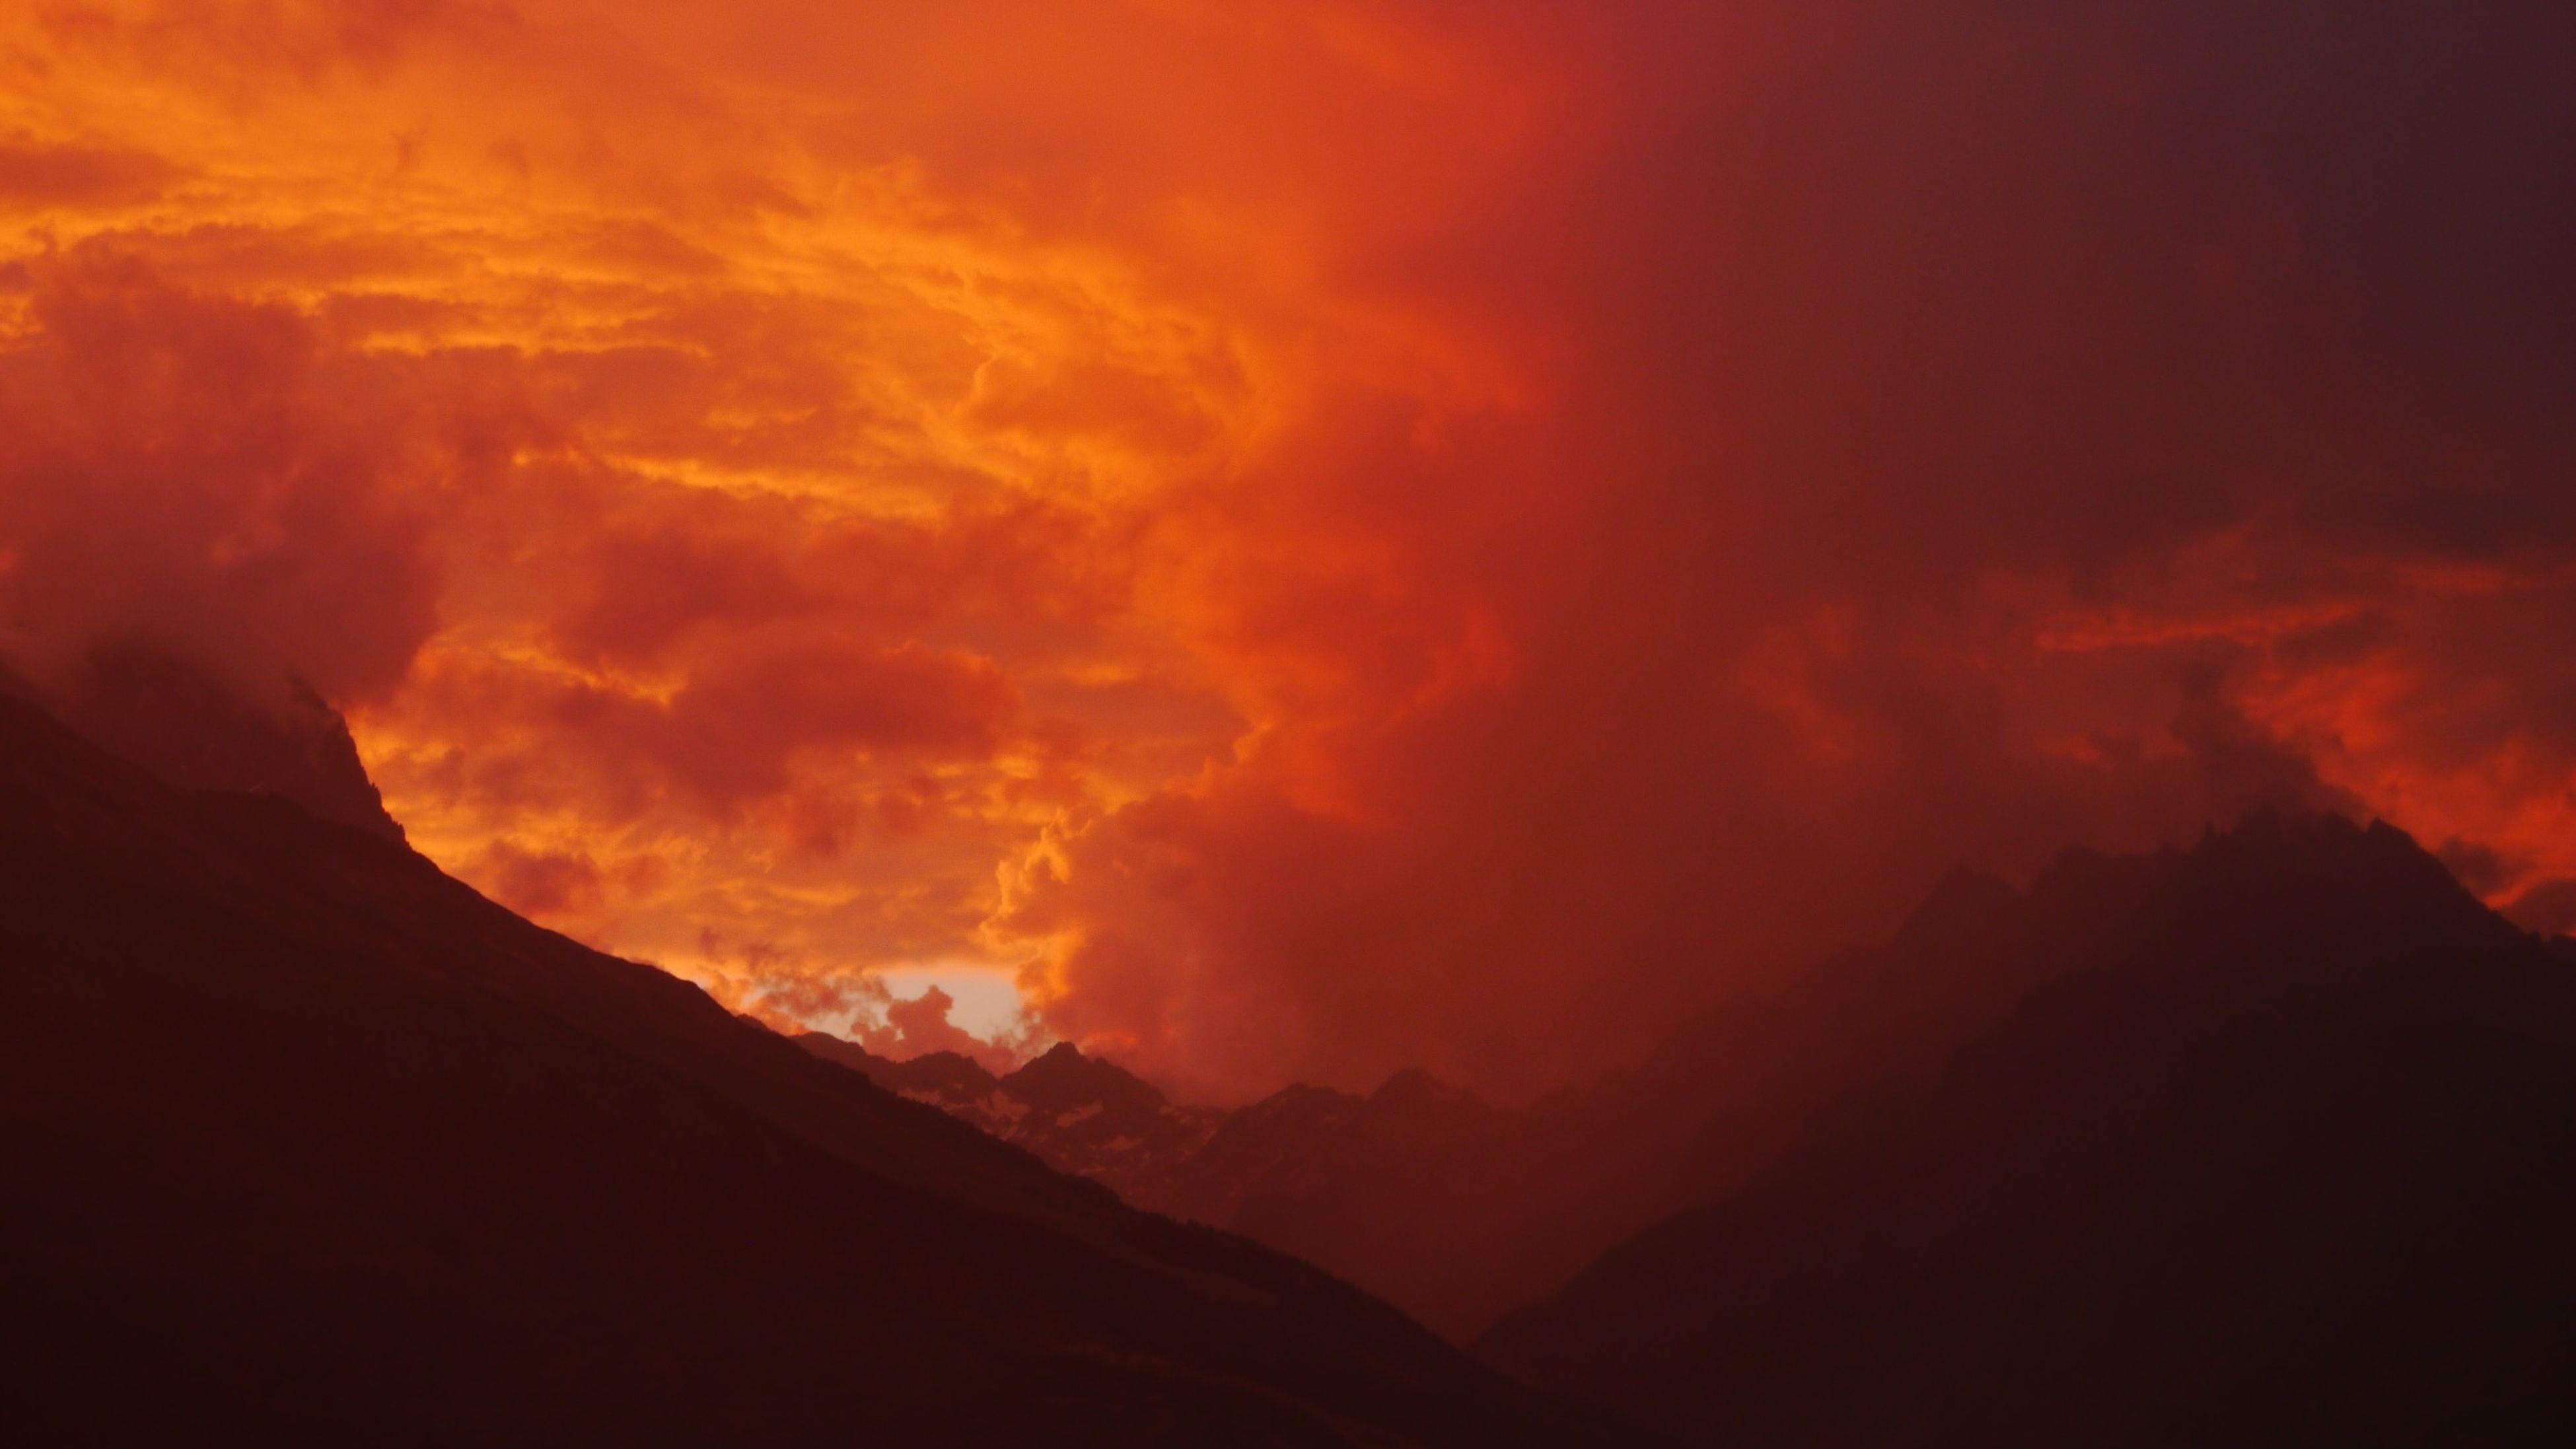 sunset, scenics, tranquil scene, beauty in nature, mountain, tranquility, sky, orange color, silhouette, cloud - sky, idyllic, nature, mountain range, dramatic sky, majestic, landscape, cloud, weather, non-urban scene, cloudy